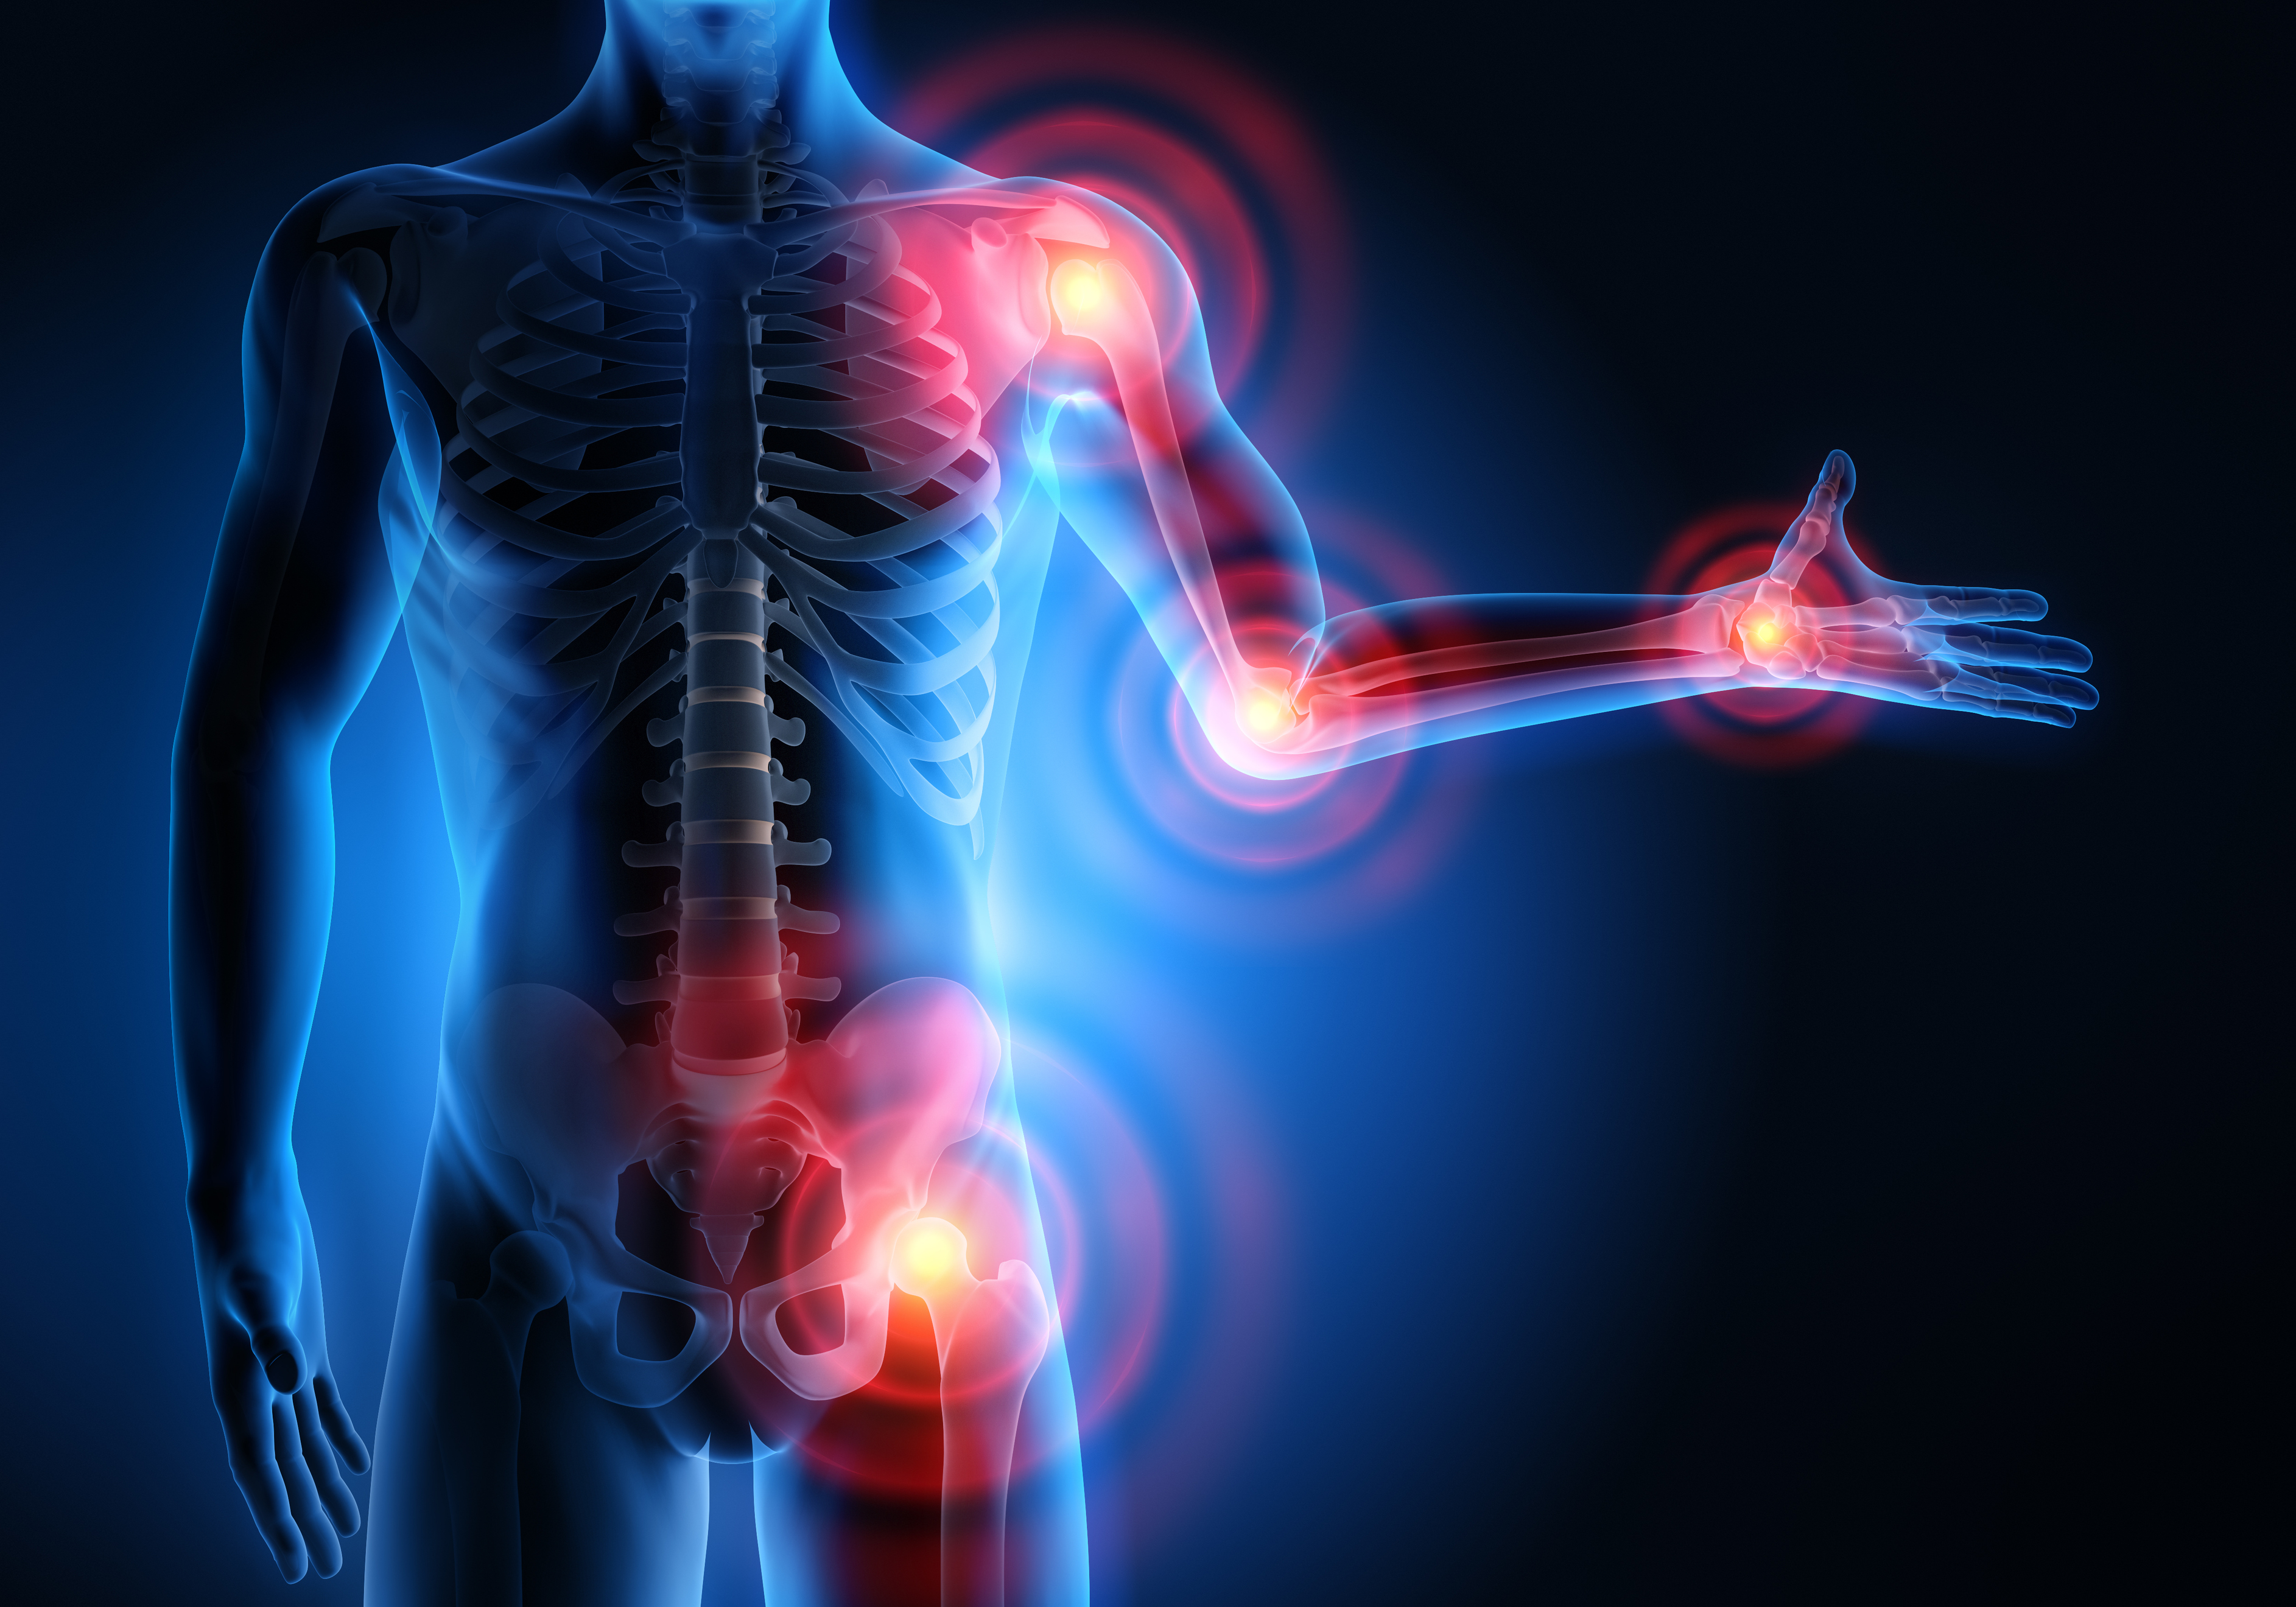 Inflammation des articulations